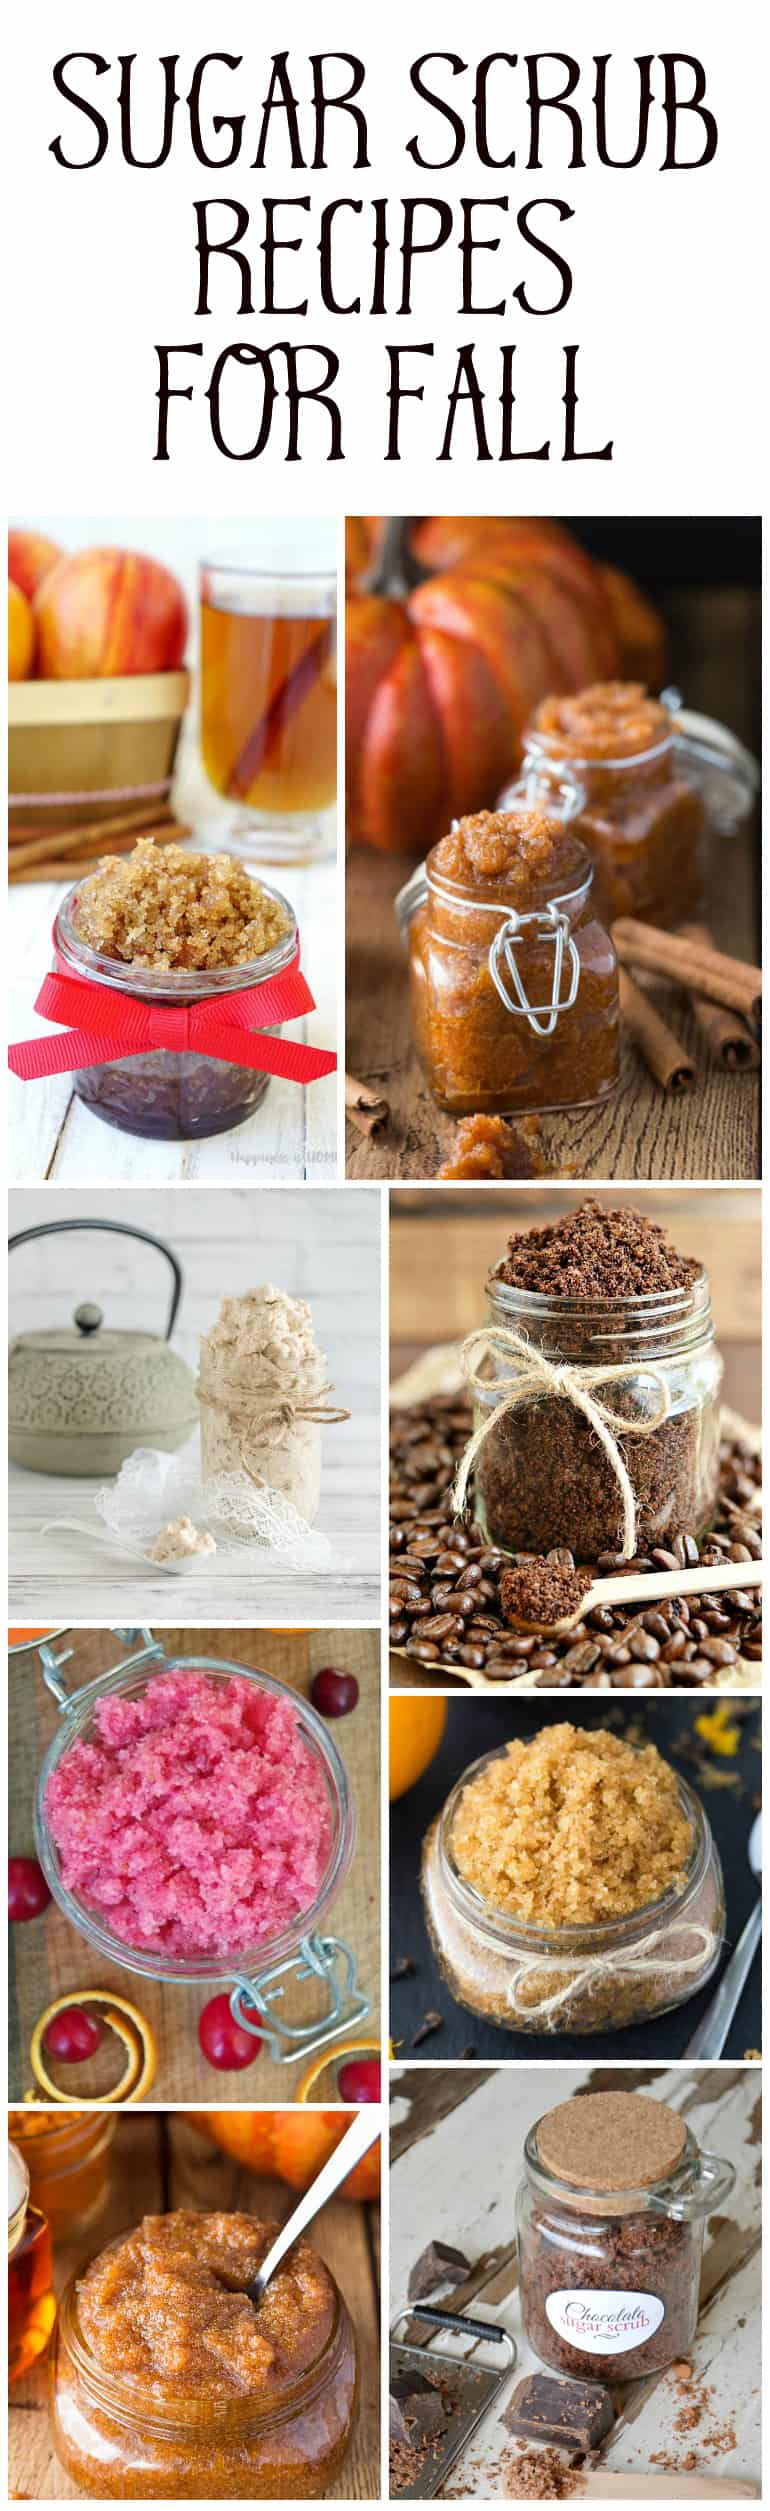 sugar scrub recipes for fall roundup